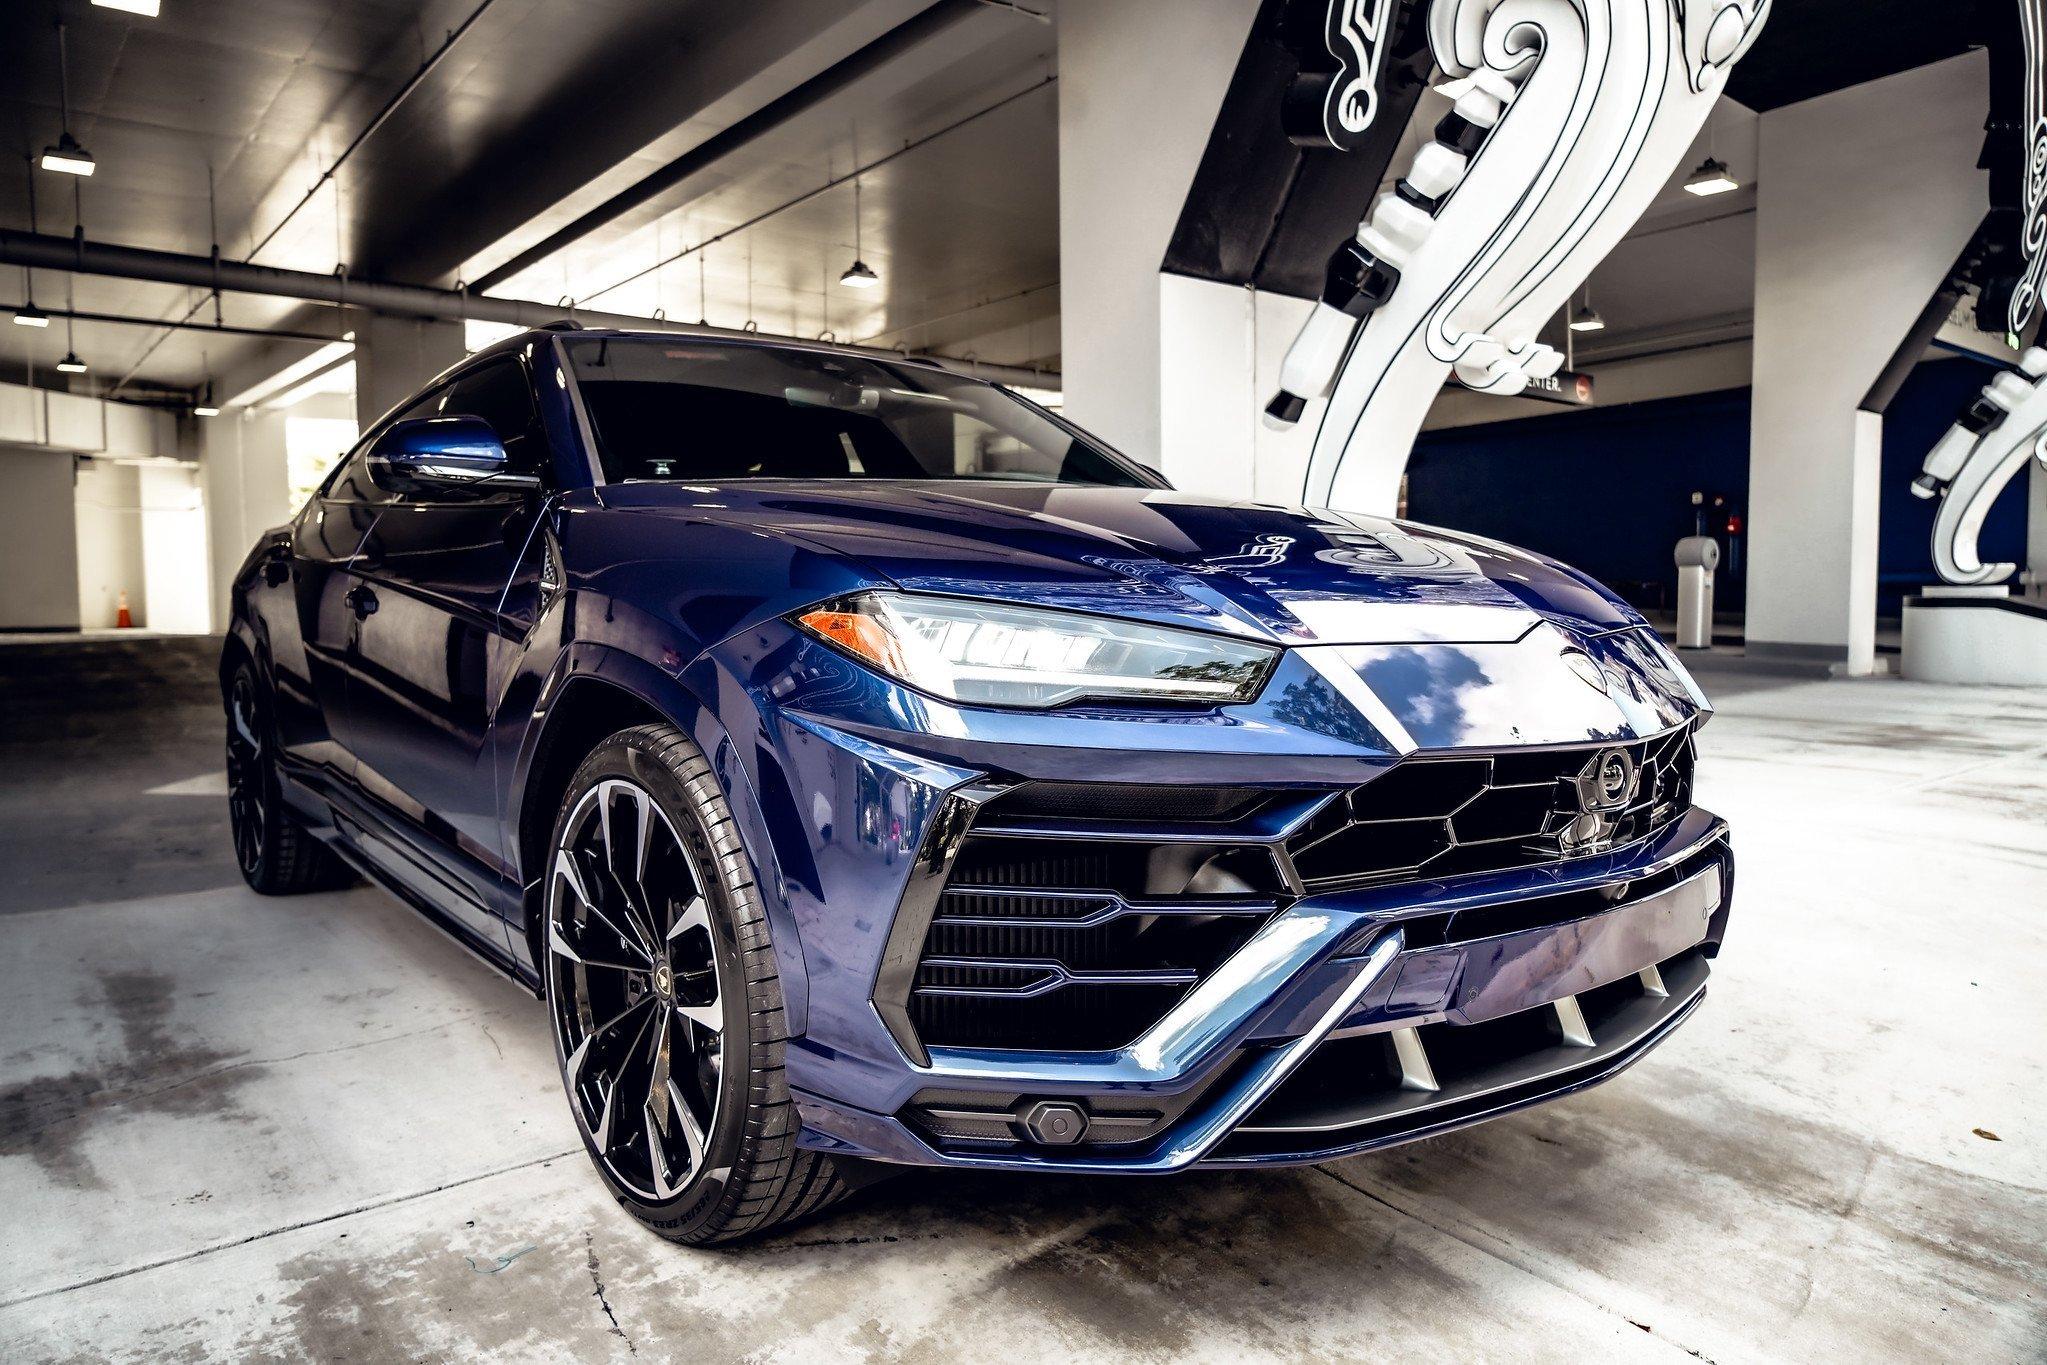 Image #11 of our  2021 Lamborghini Urus - Dark Blue    In Miami Fort Lauderdale Palm Beach South Florida